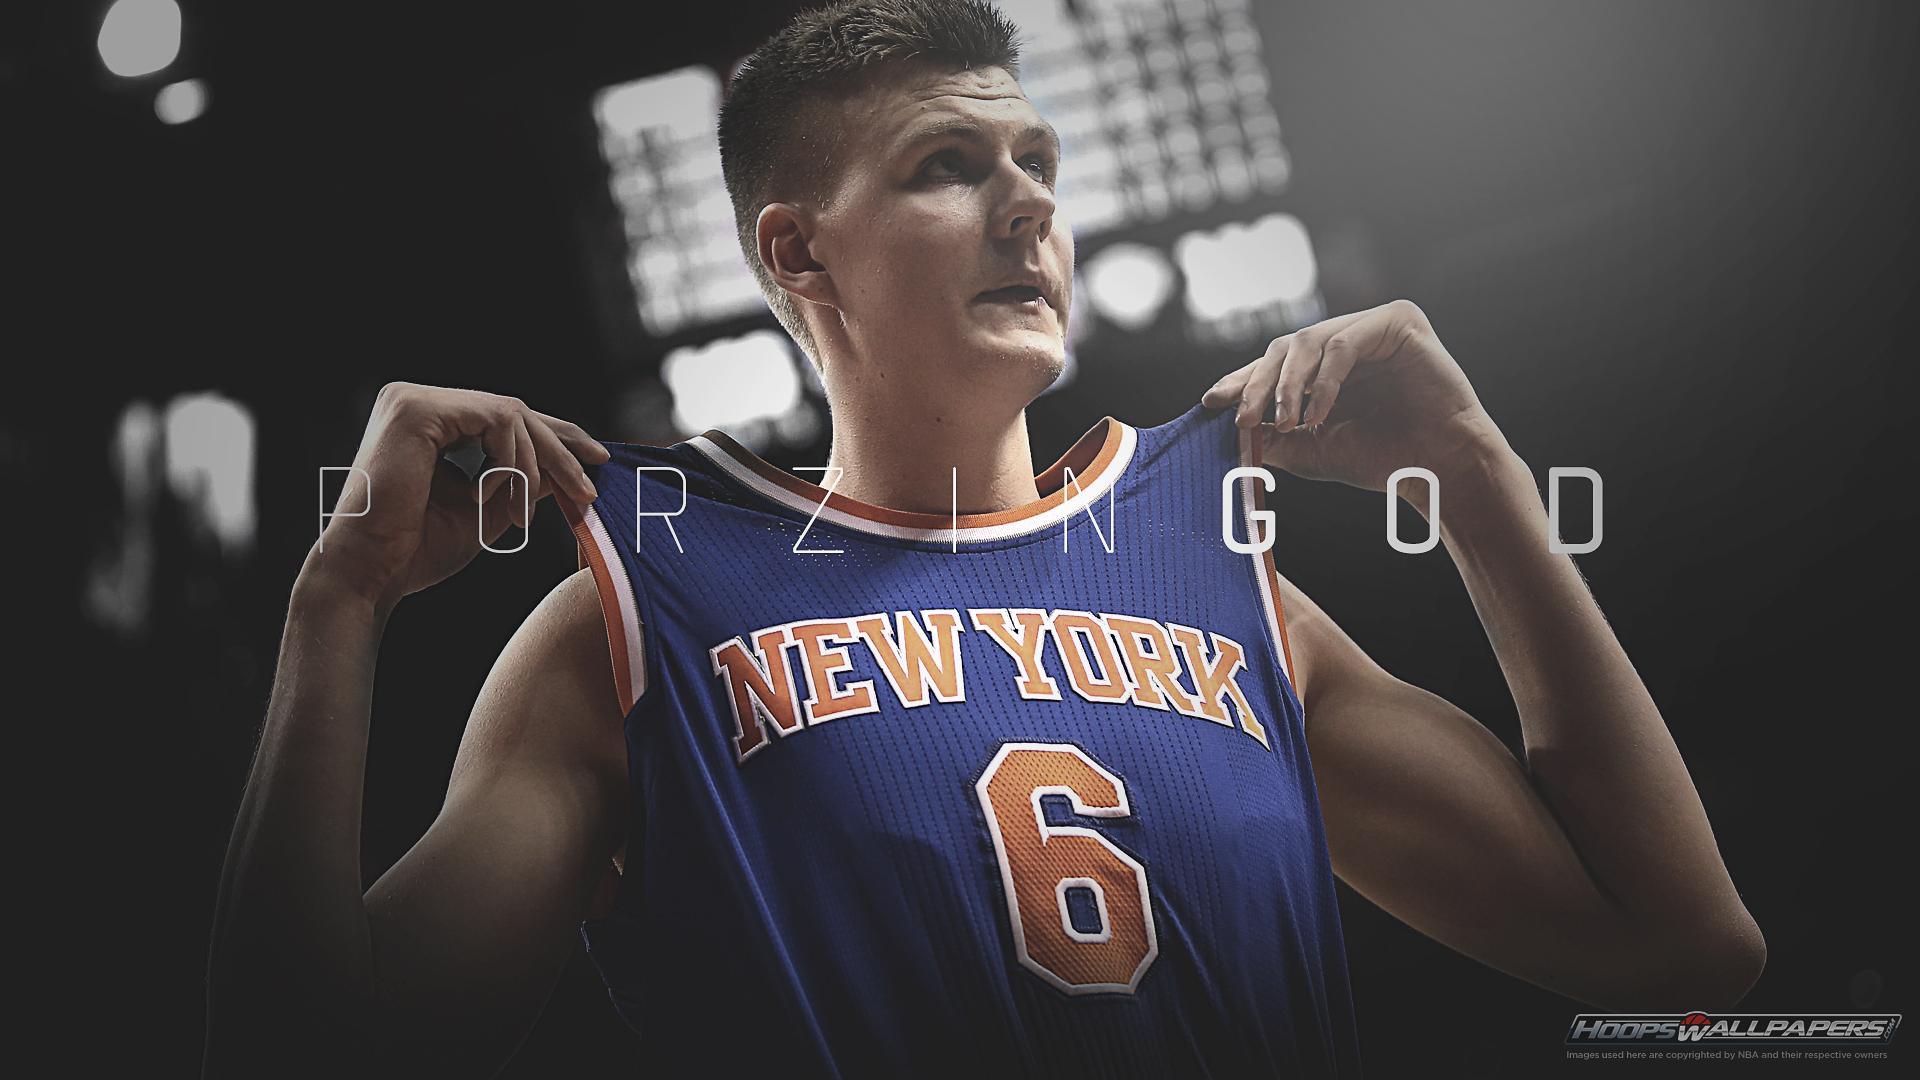 Kristaps Porzingis Knicks Wallpaper on